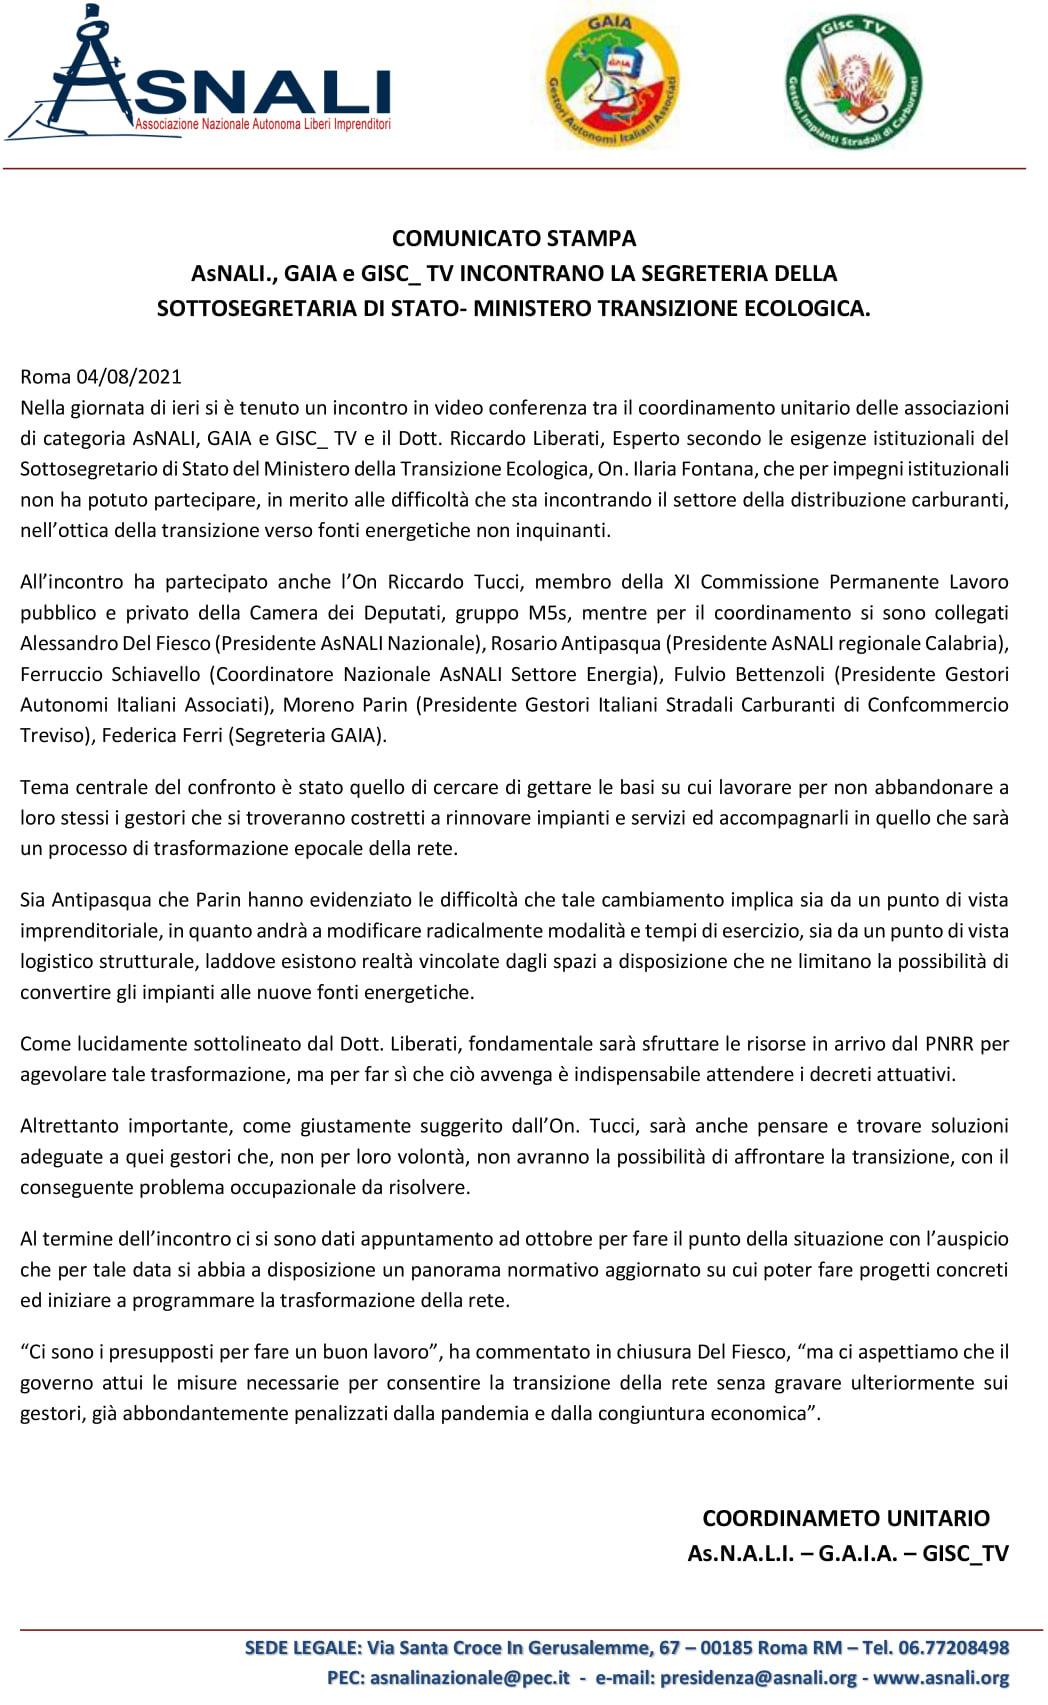 comunicatostampaincontrosegreteriaministerotransizioneecologica4agosto2021-1628090809.jpg